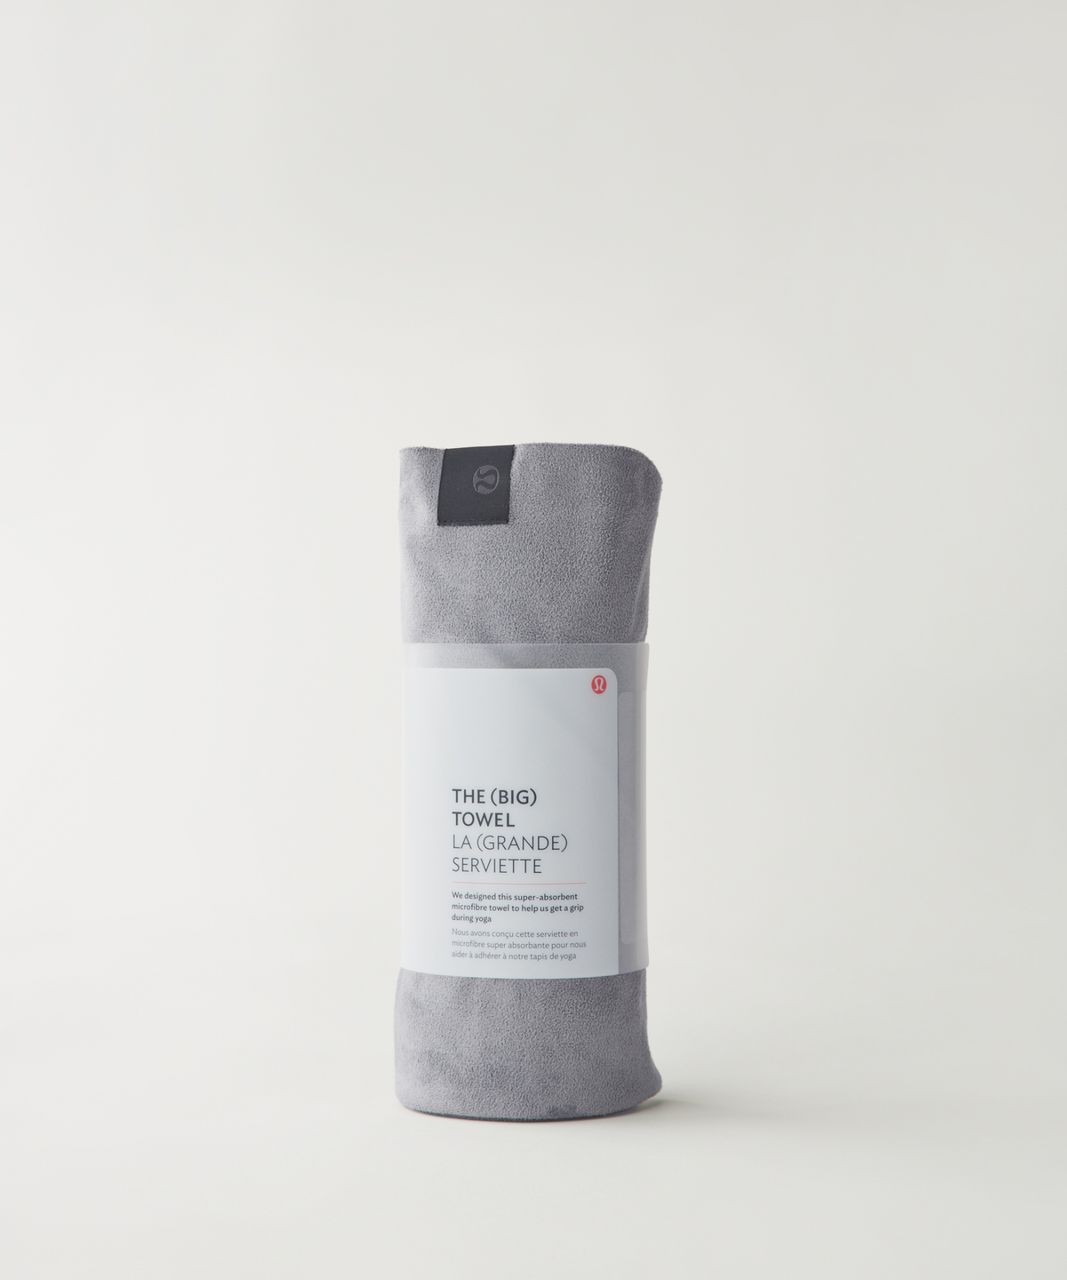 Lululemon The (Big) Towel - Battleship